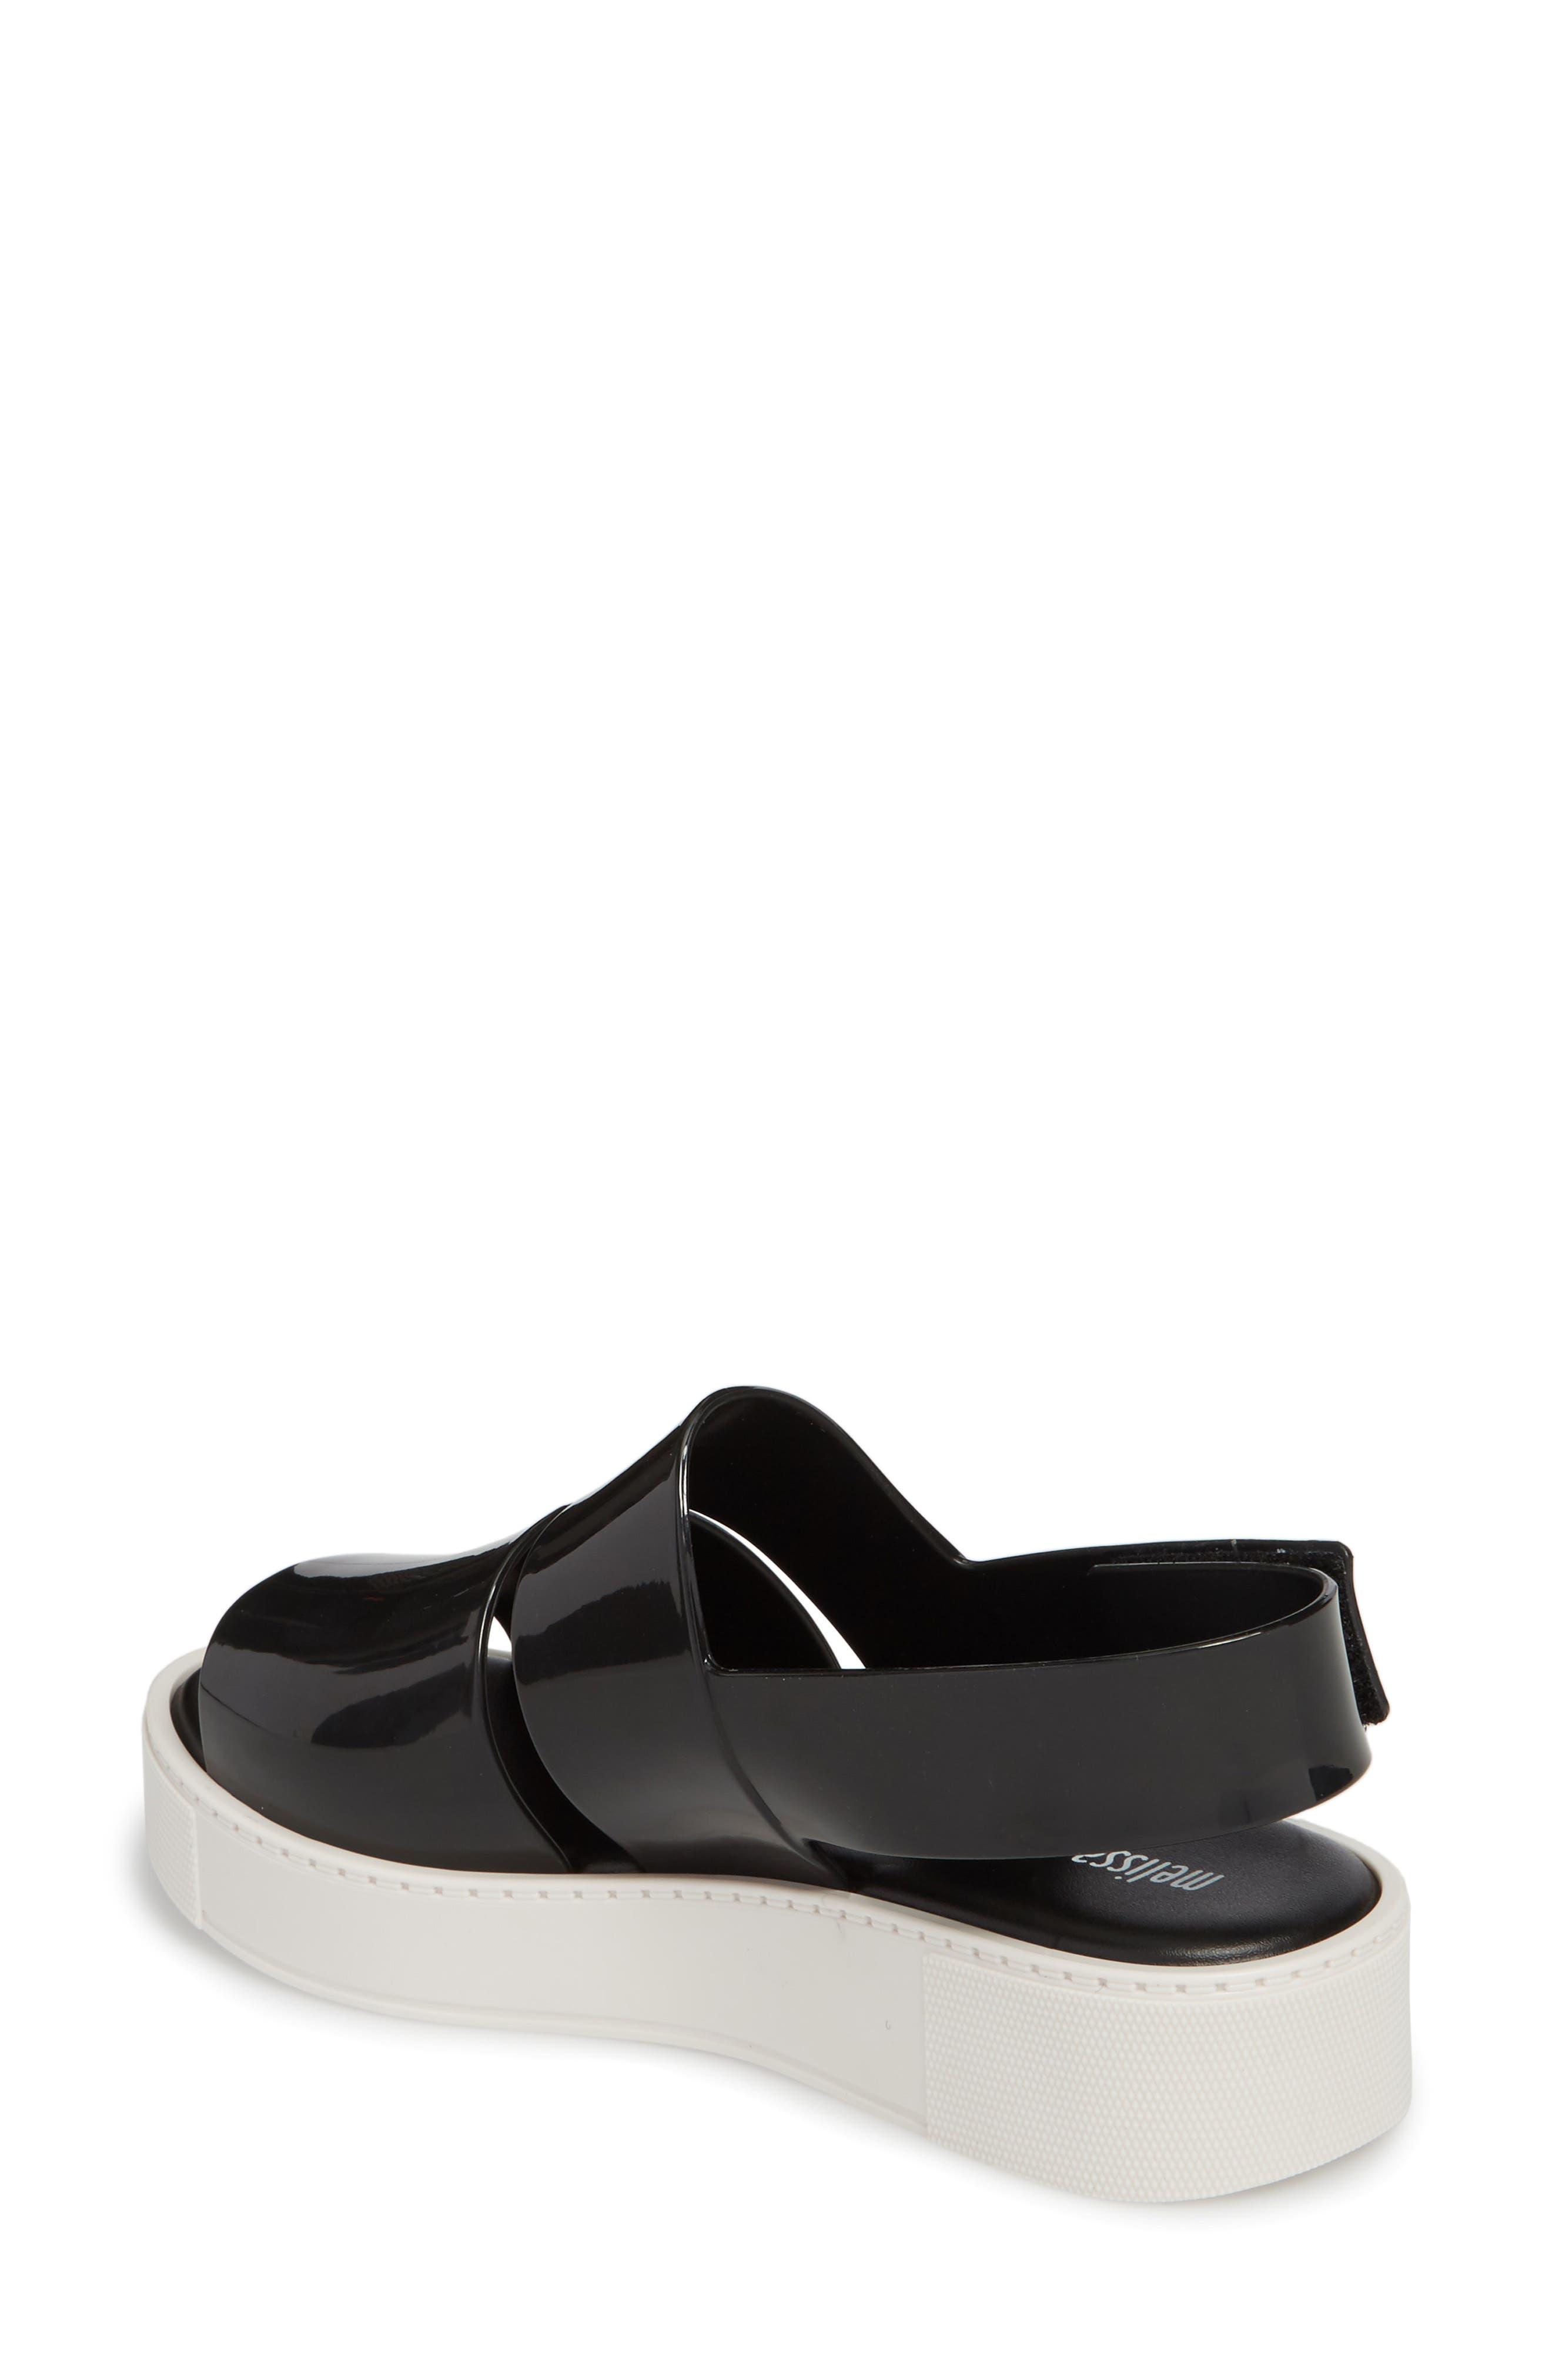 Soho Platform Sandal,                             Alternate thumbnail 3, color,